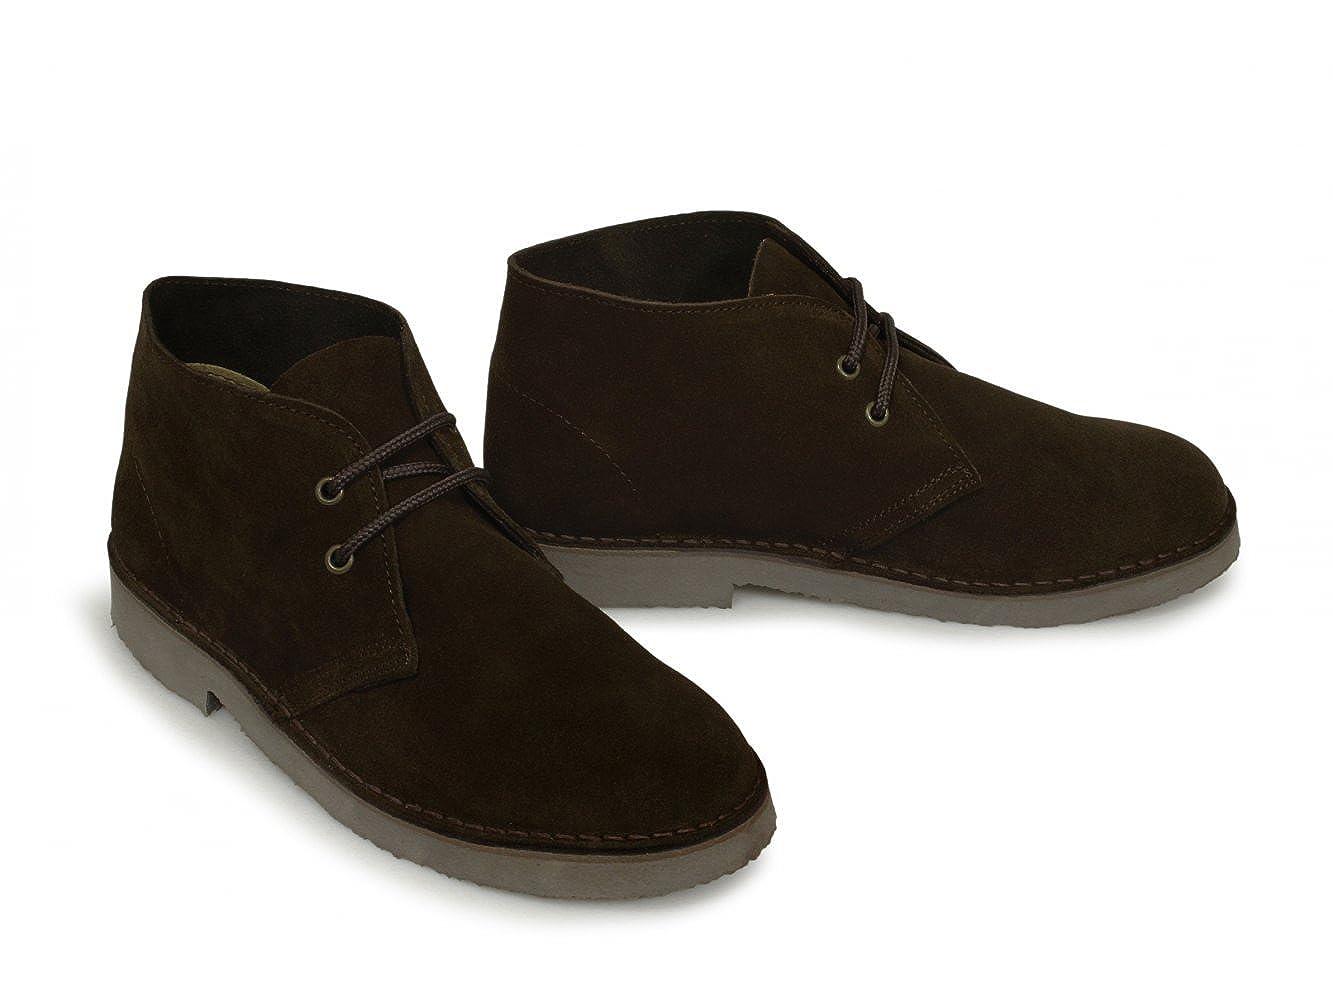 c64d7488f94 Roamers - Roamers Fashion Desert Boots - Dark Brown Real Suede, Mens UK 3 /  EU 37